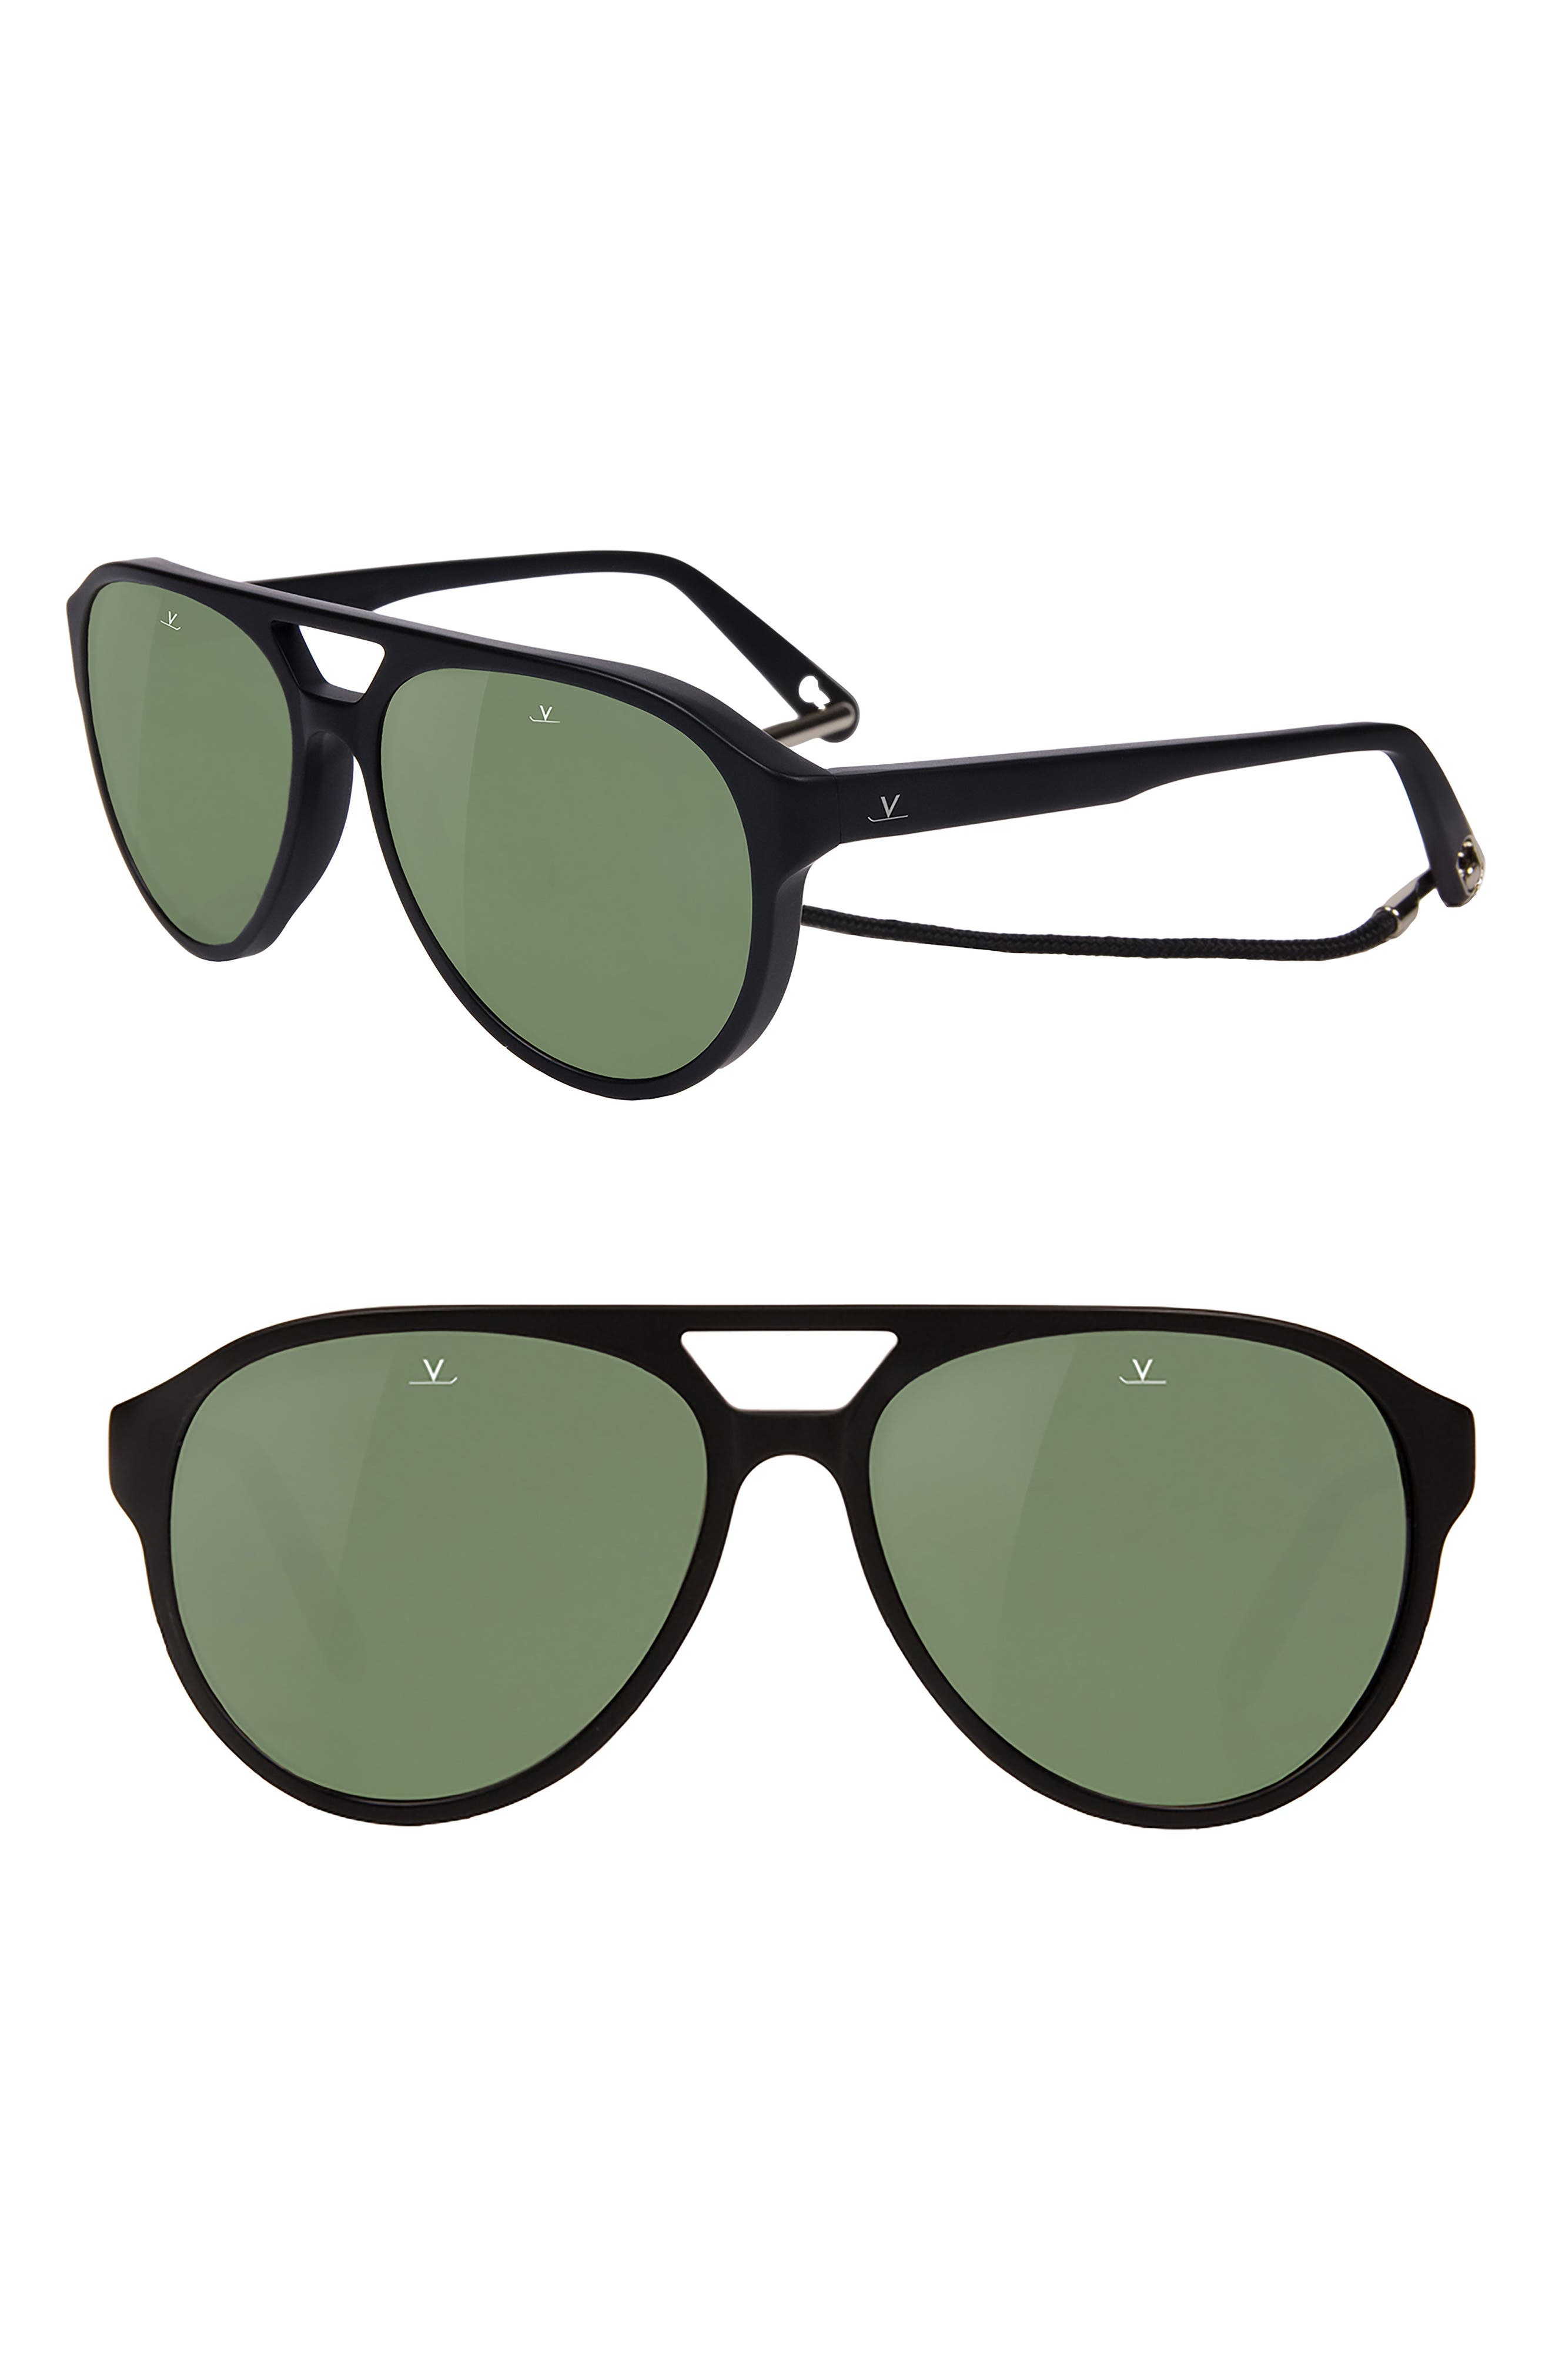 Tom 64mm Sunglasses,                         Main,                         color, 008